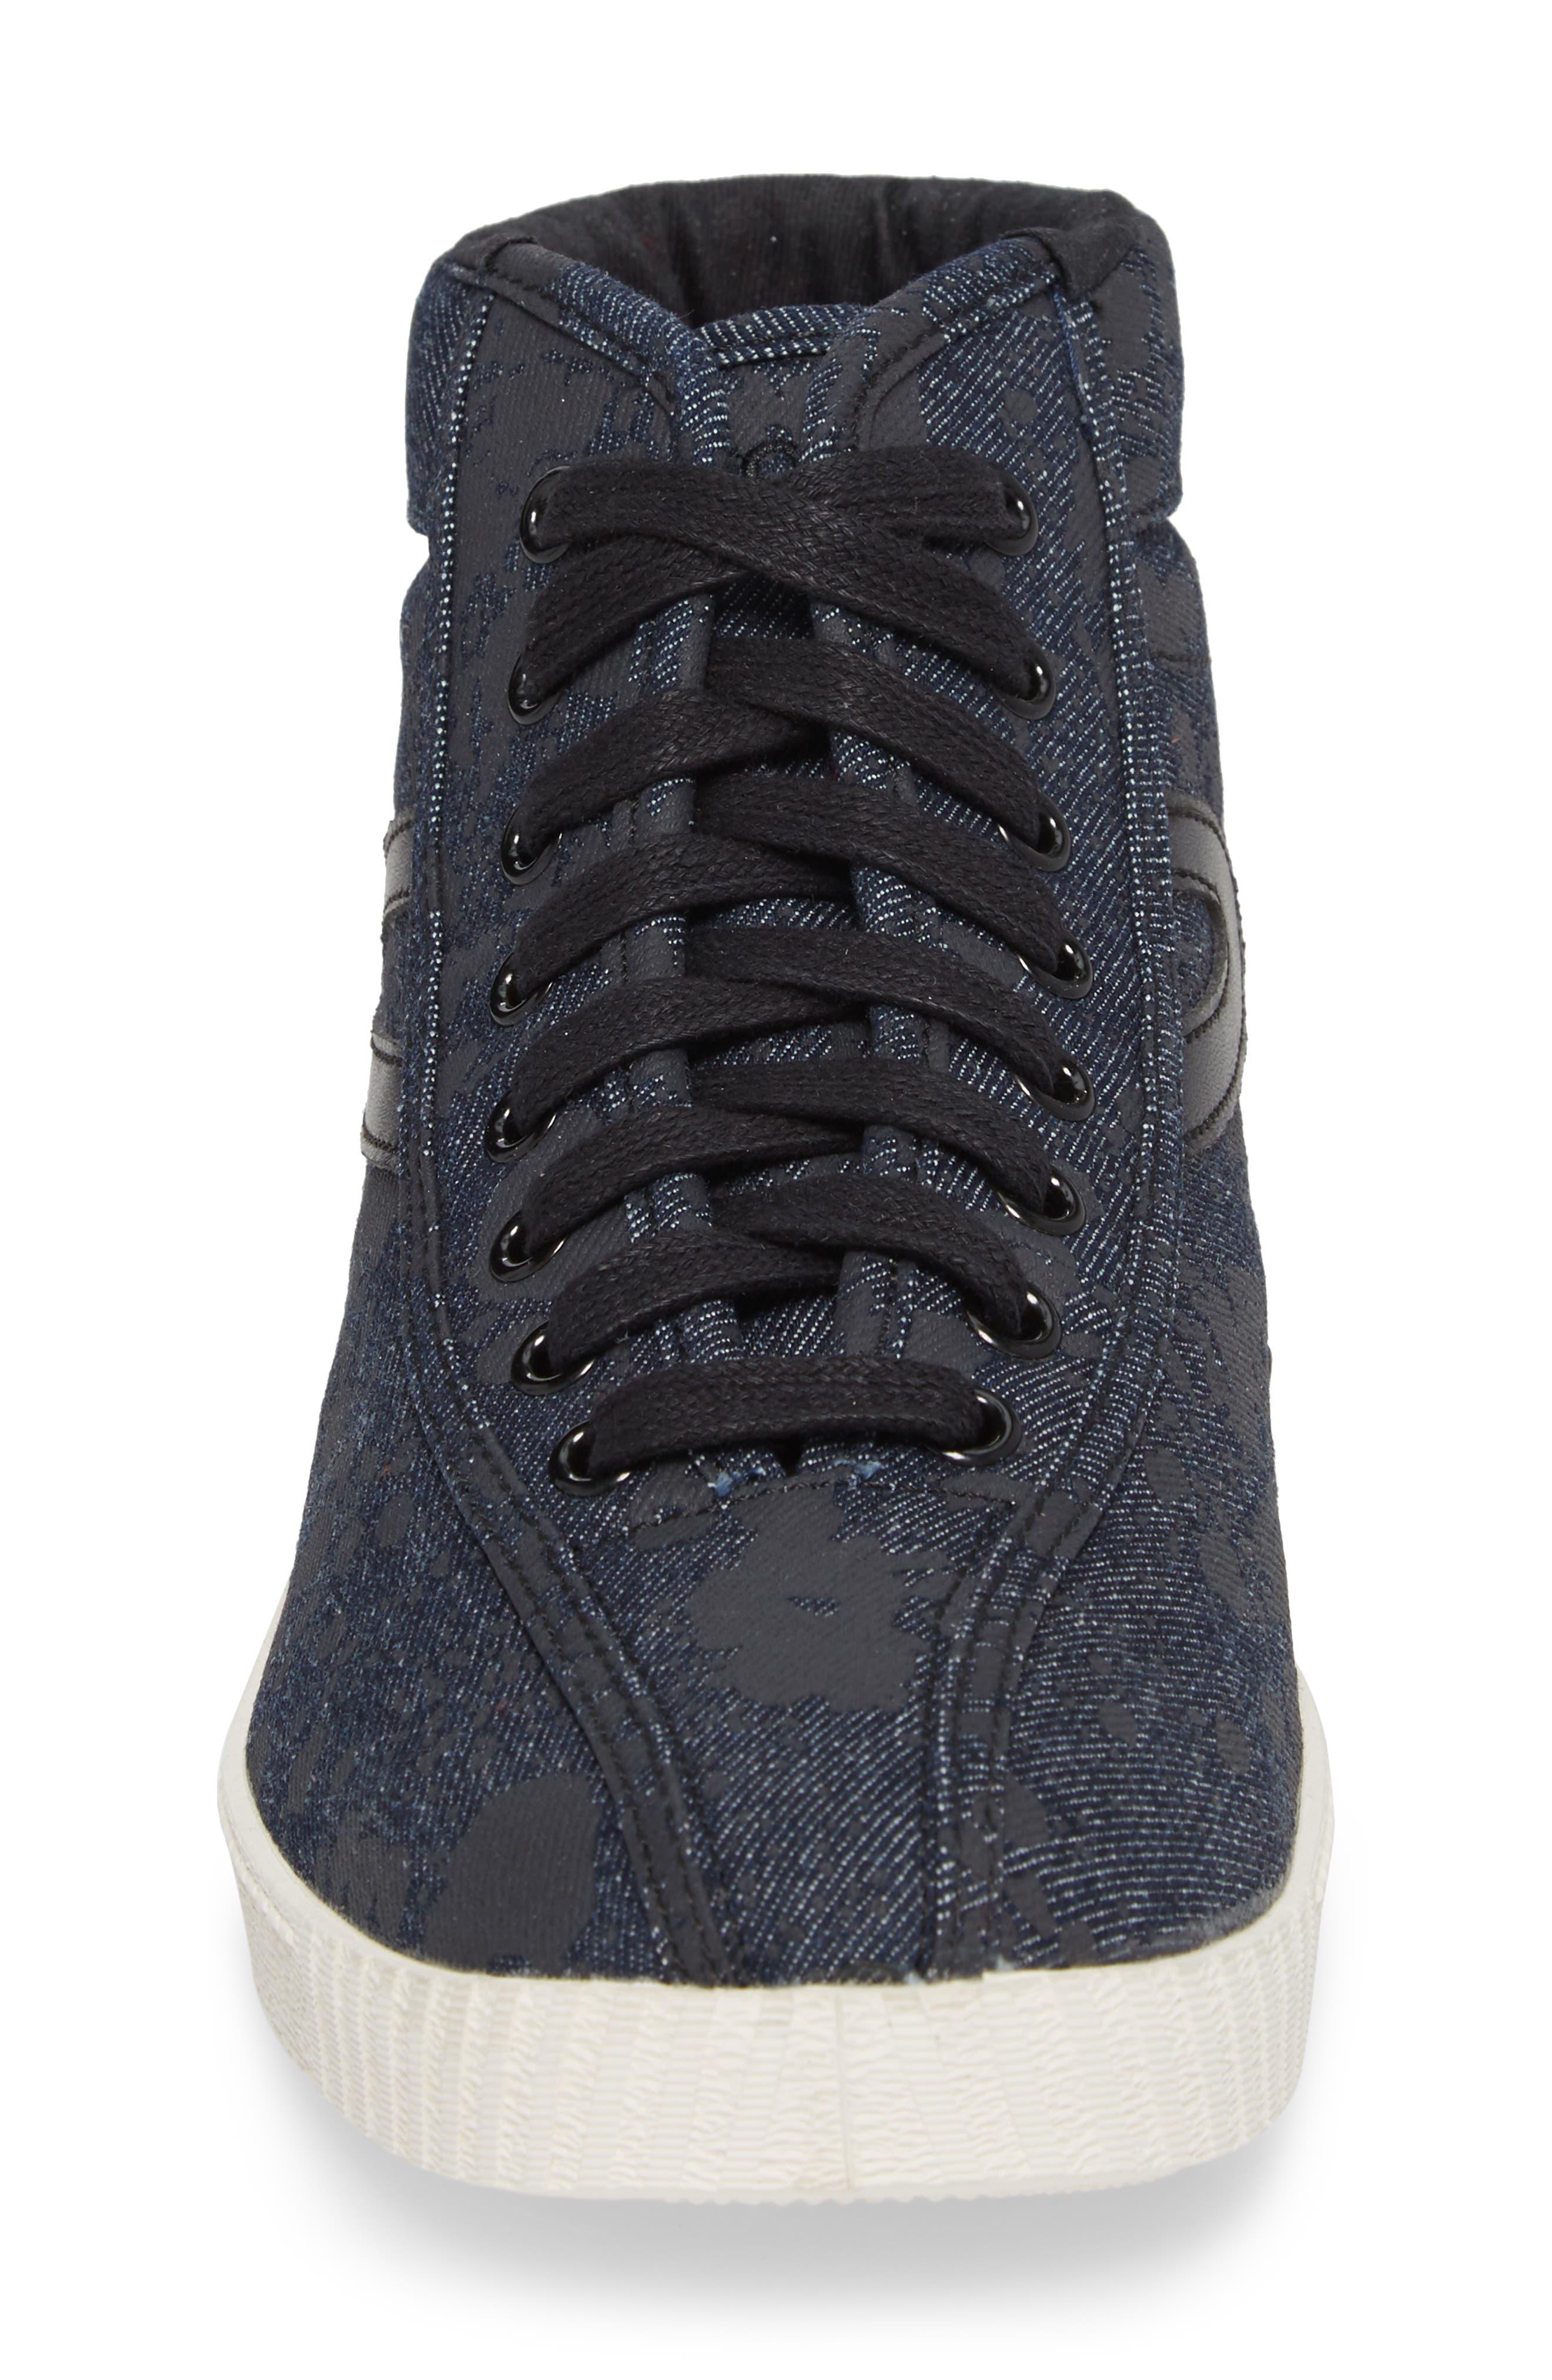 Nylite High Top Sneaker,                             Alternate thumbnail 4, color,                             Nero Opaco/ Black Denim